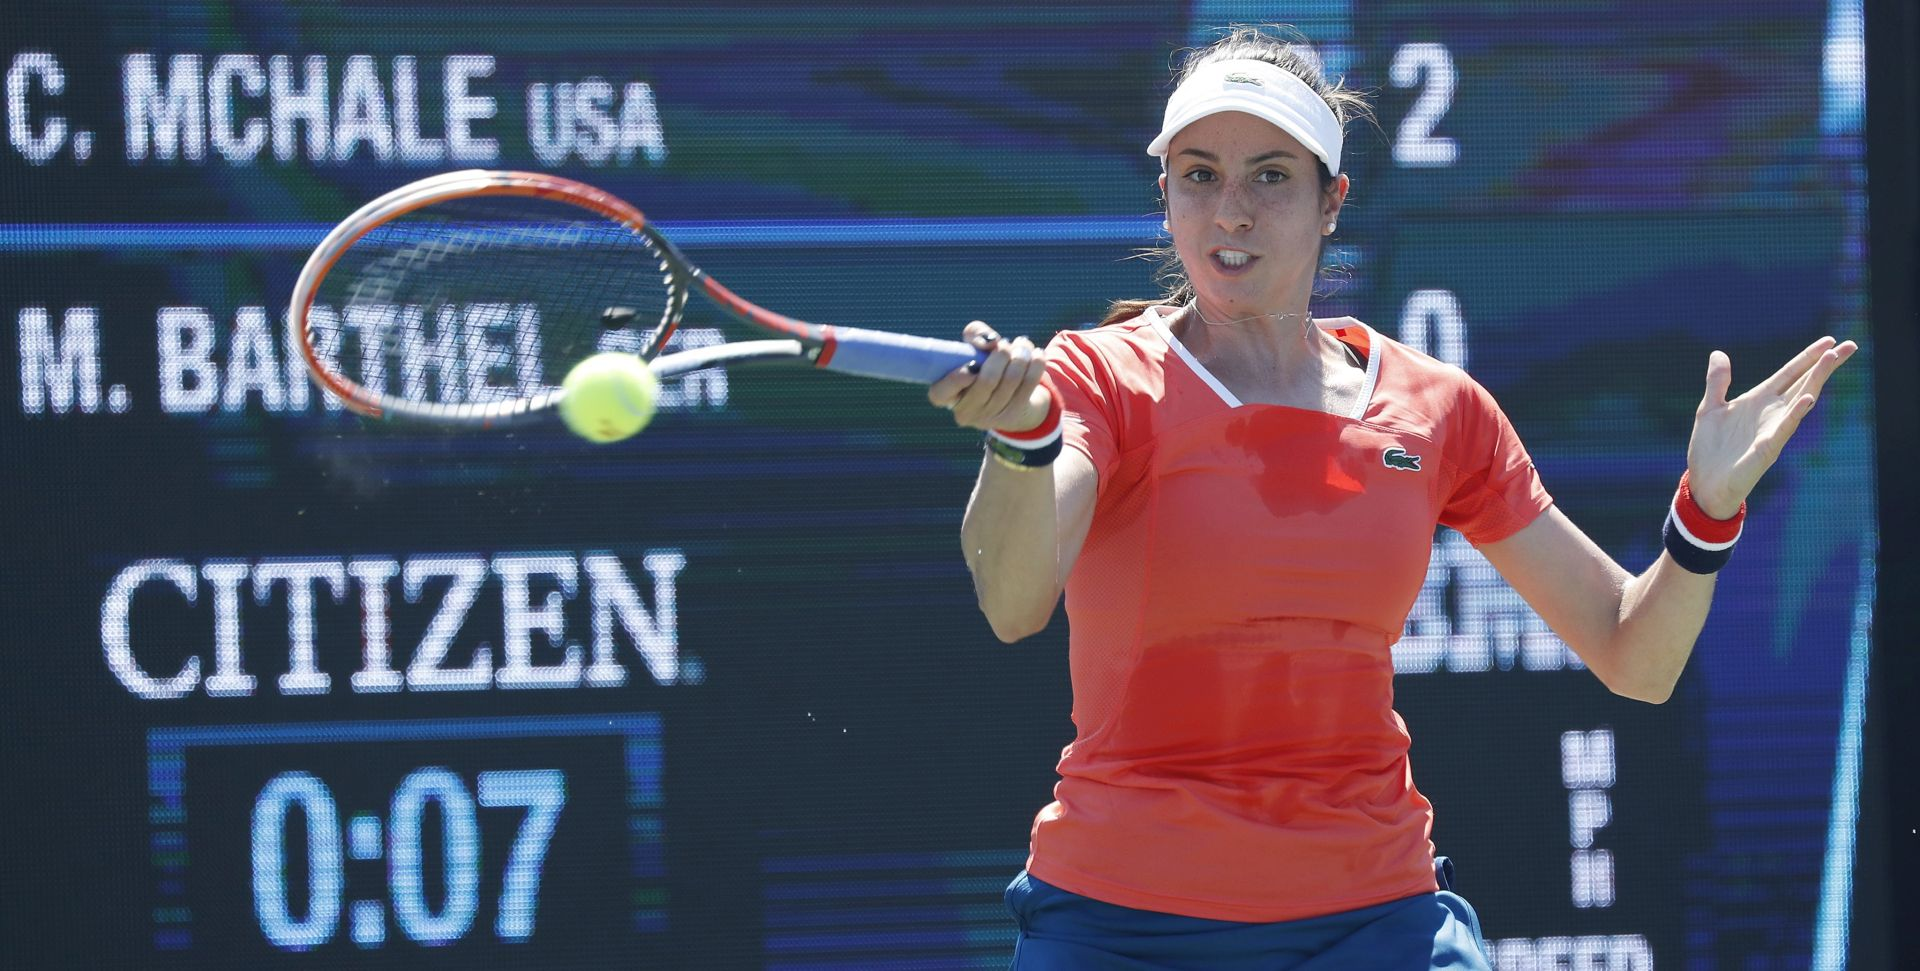 WTA TOKIO: Siniakova i McHale u finalu